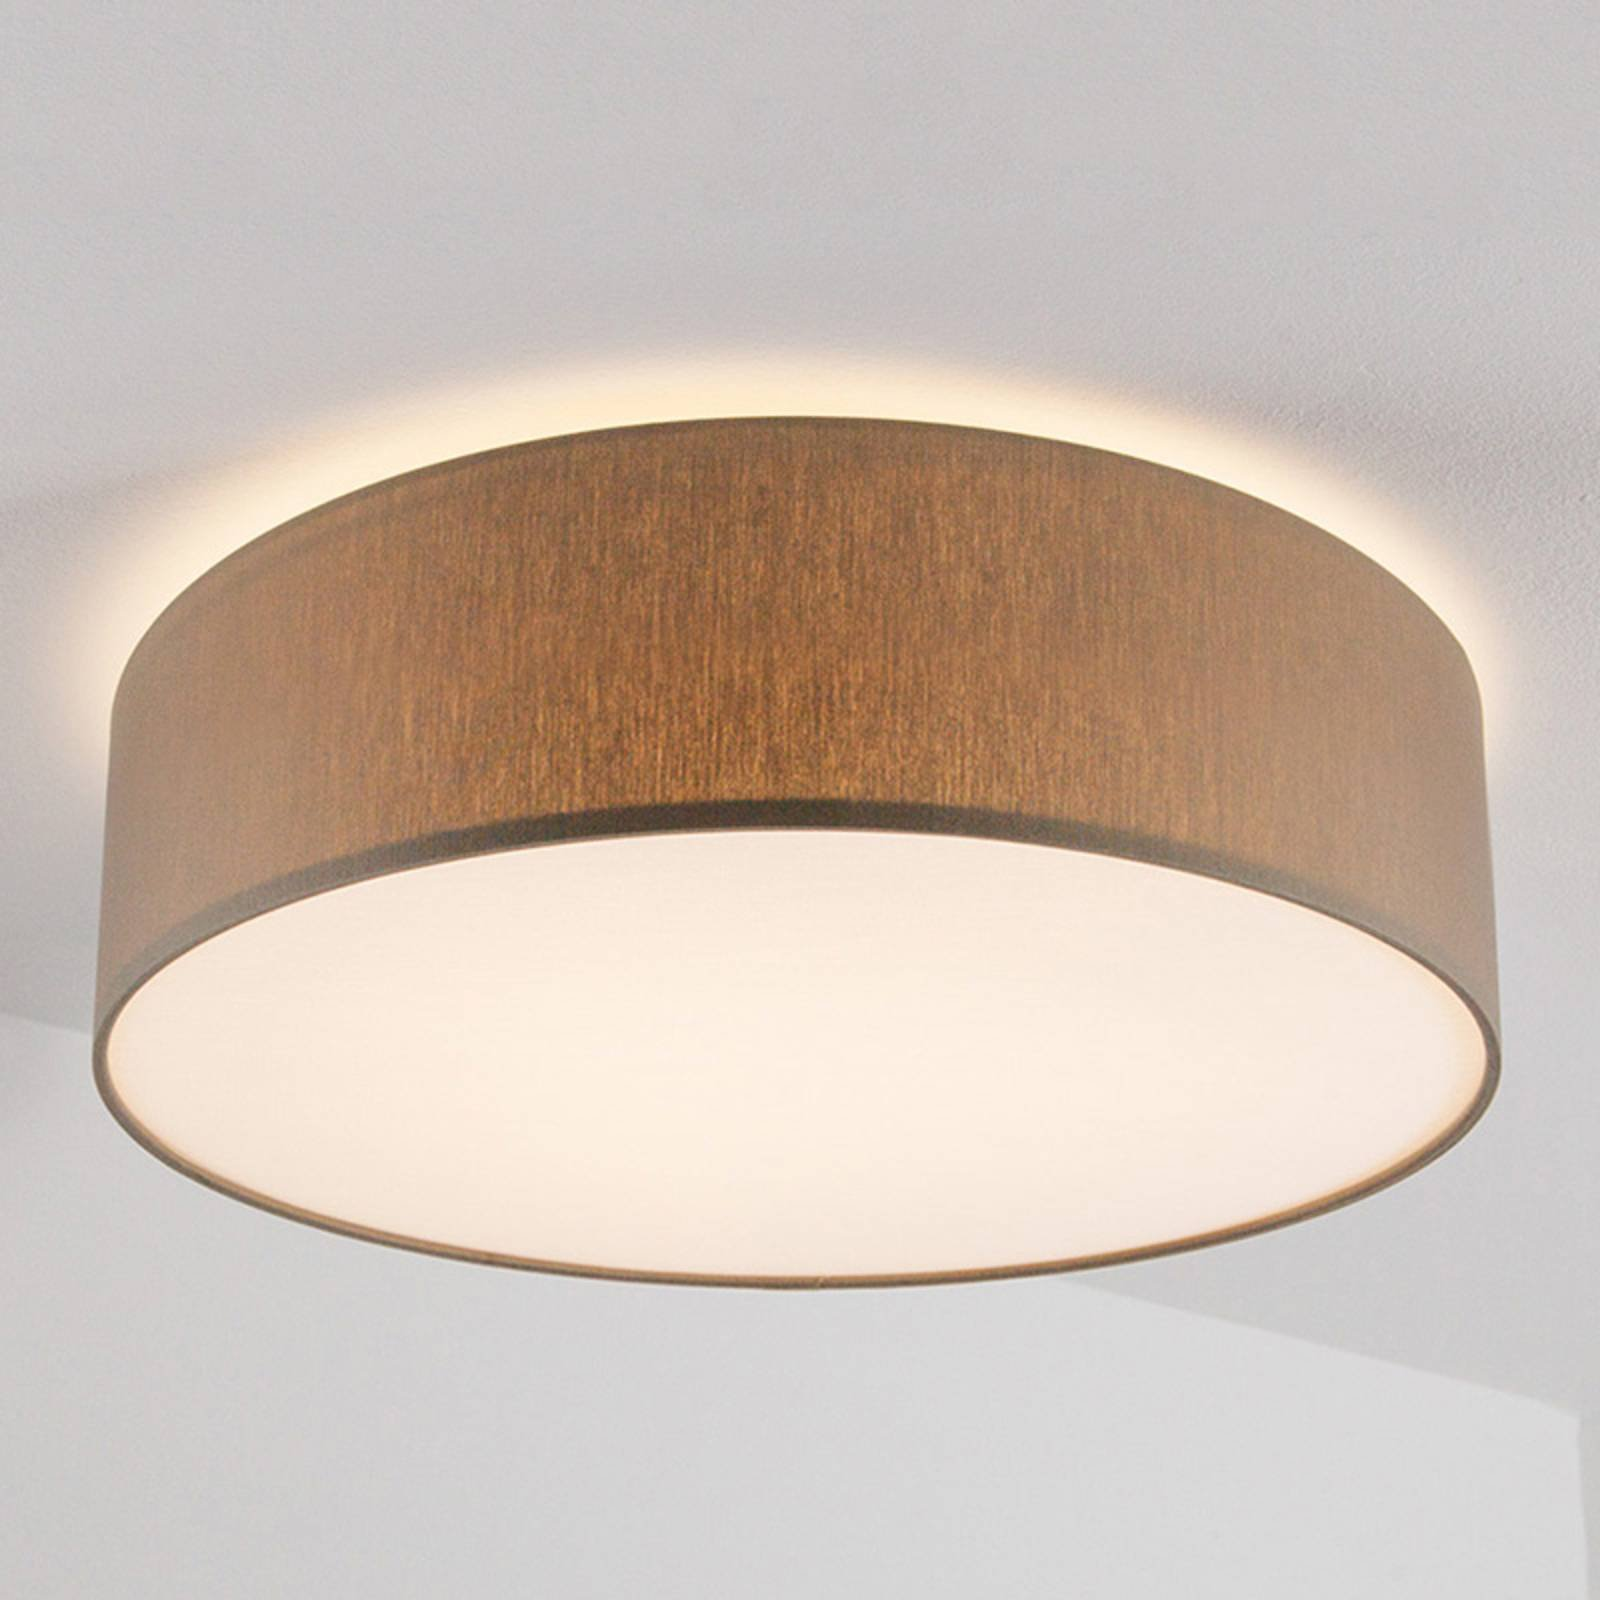 Gråbrun taklampe Mara, 60 cm